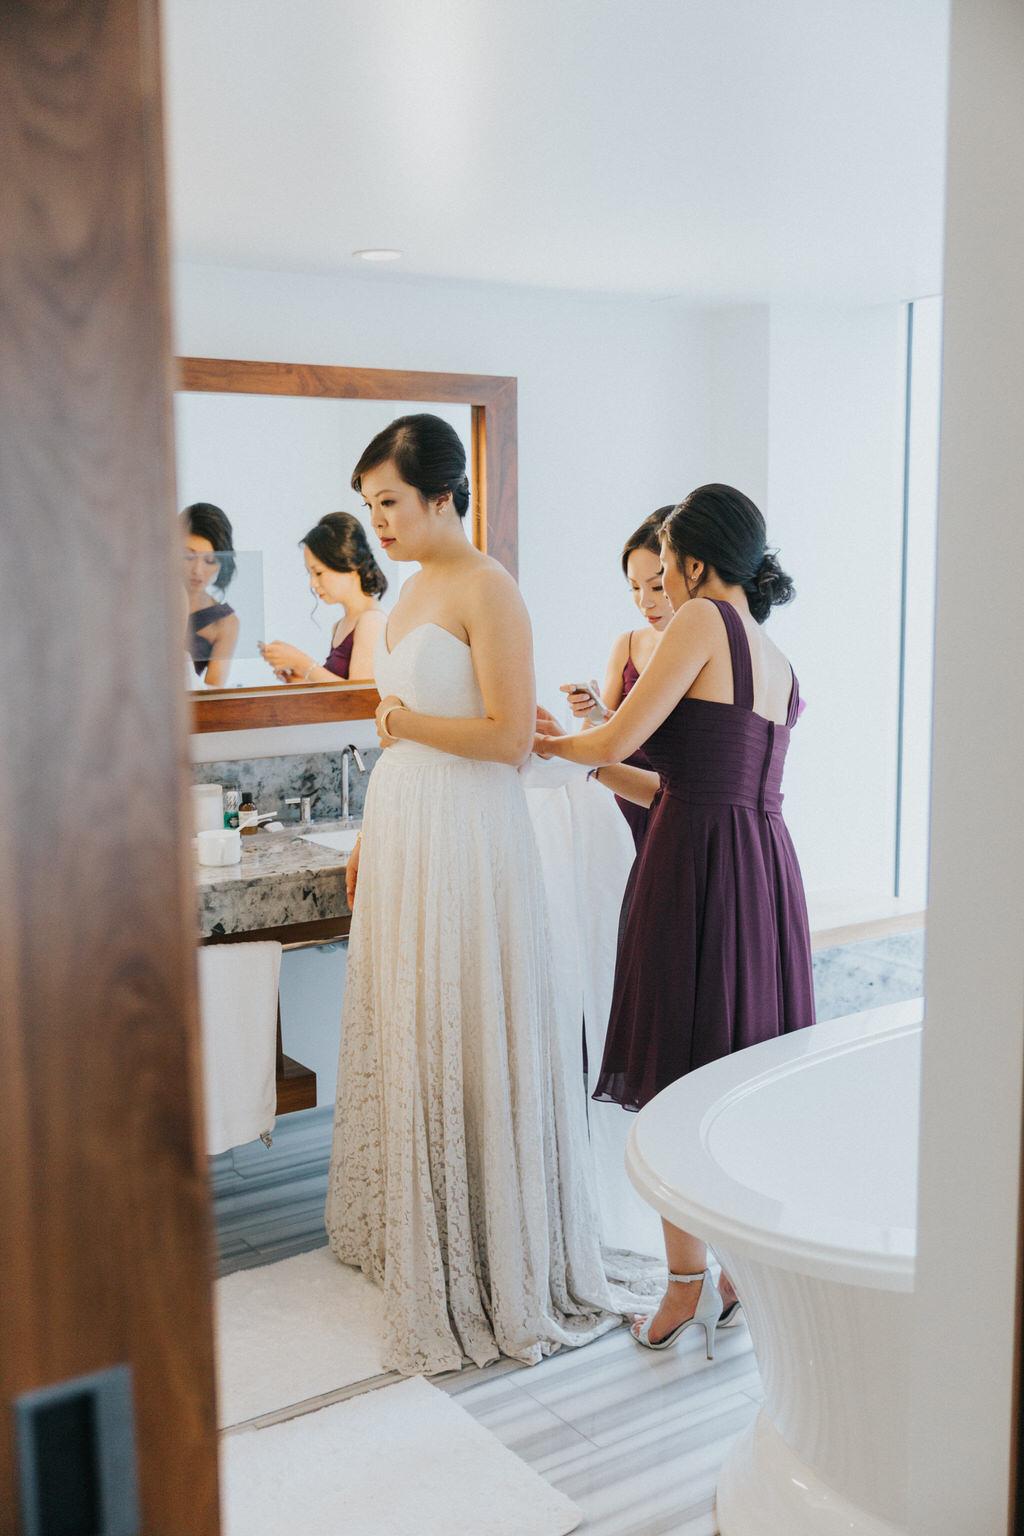 Bridesmaids zipping up brides dress